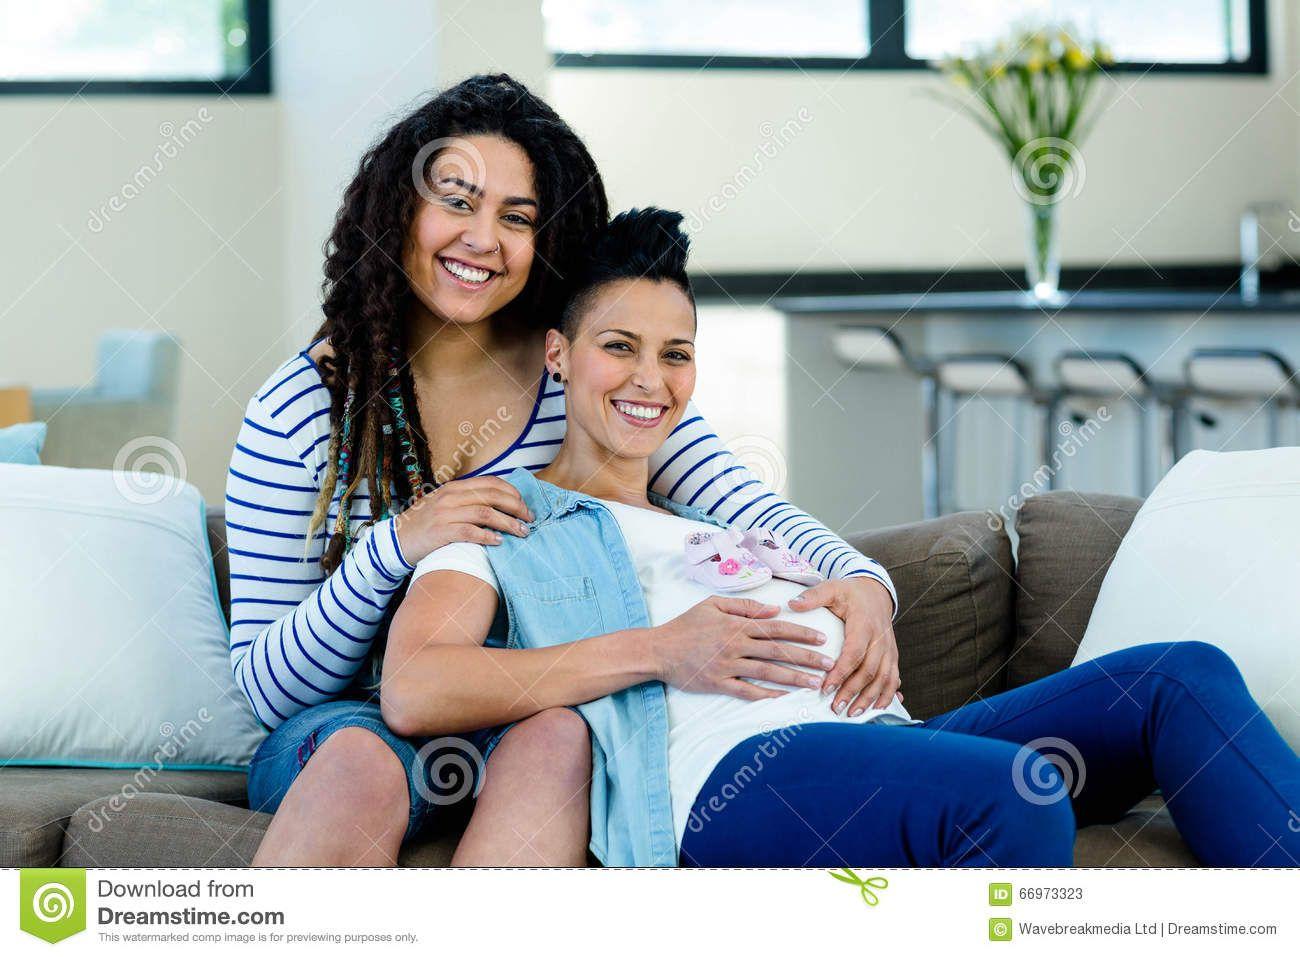 Woodshop reccomend Girl lesbian pregnant